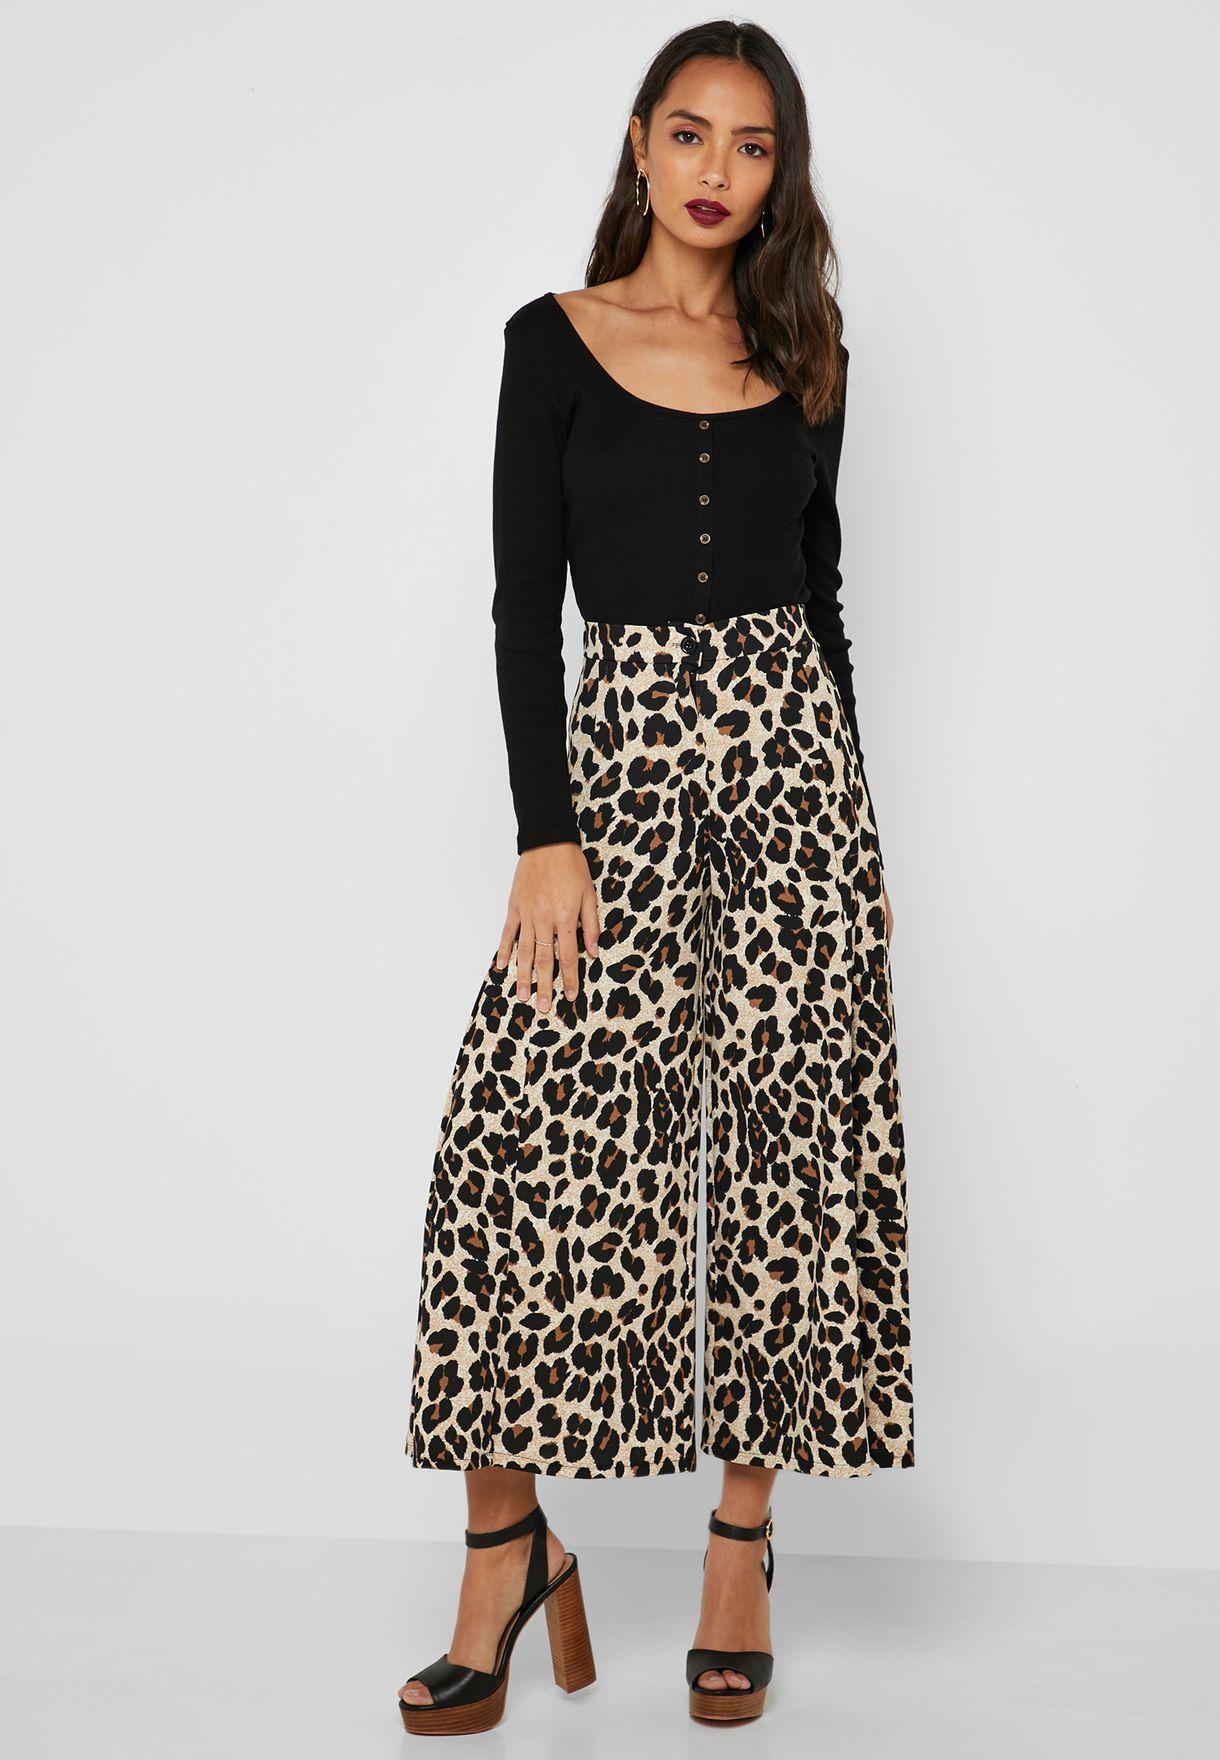 cde0c5aa1435 Shop Ginger prints Leopard Print Wide Leg Pants 8681 for Women in ...